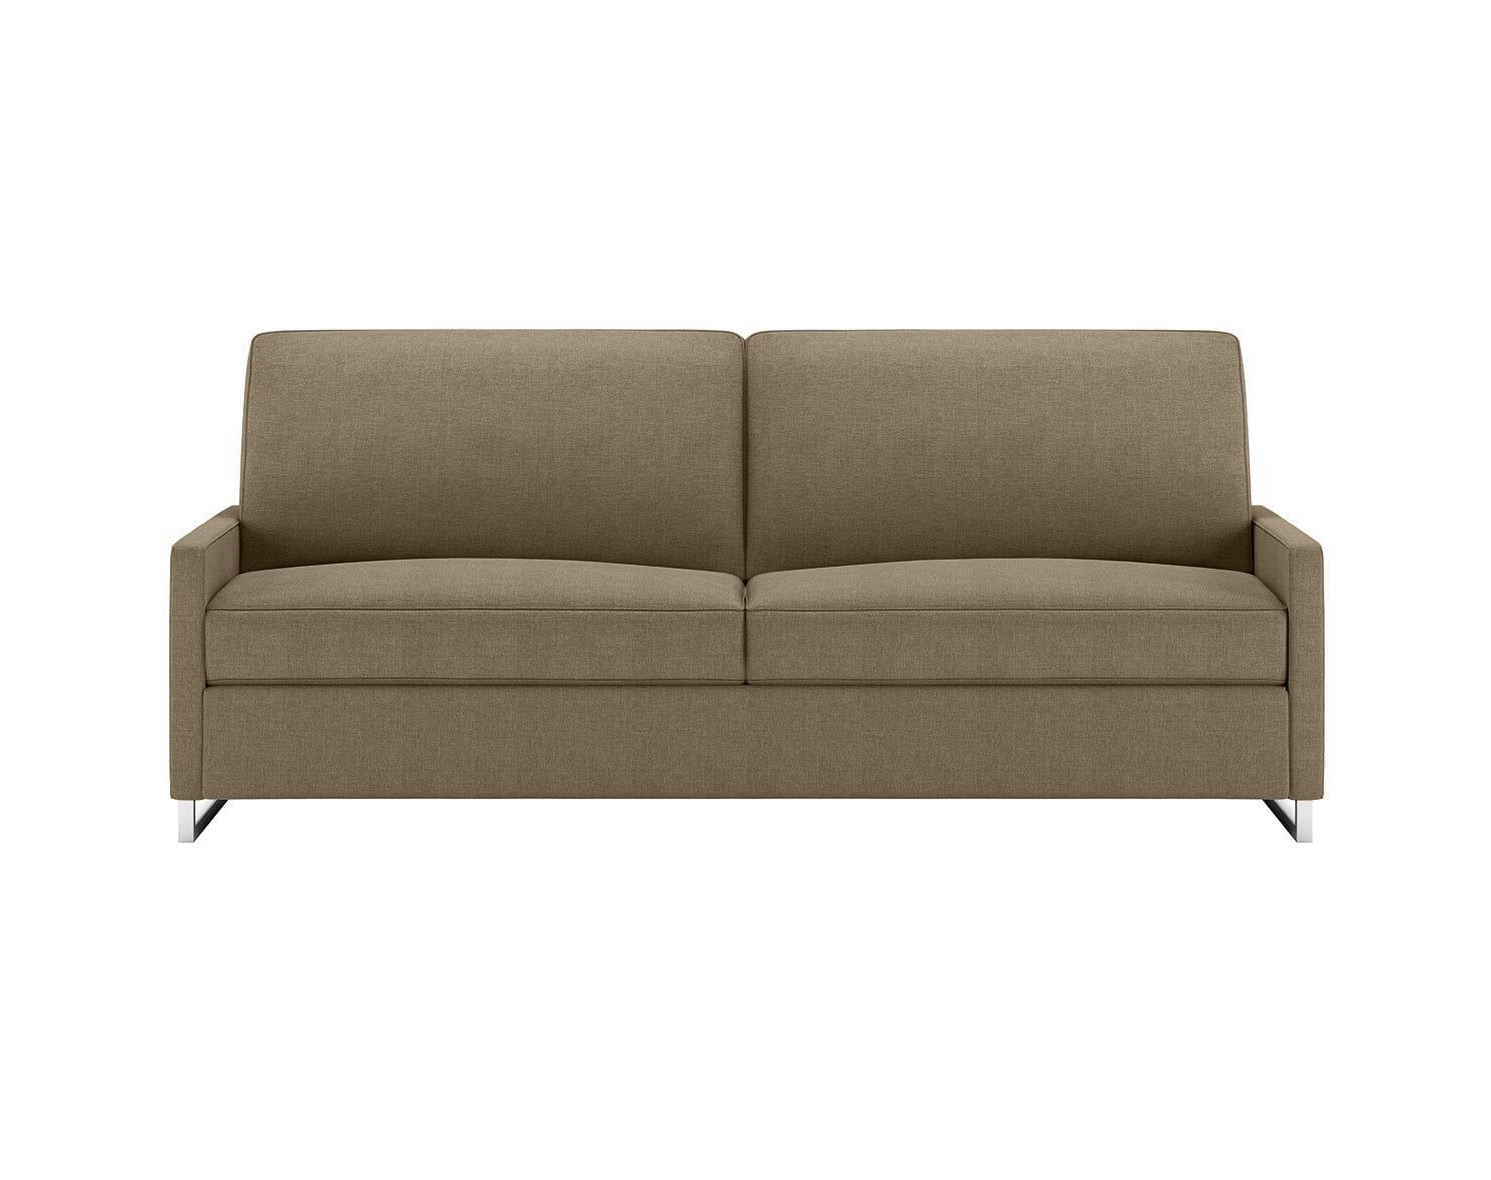 Brandt Space Saving Sleeper Sofa in Stone